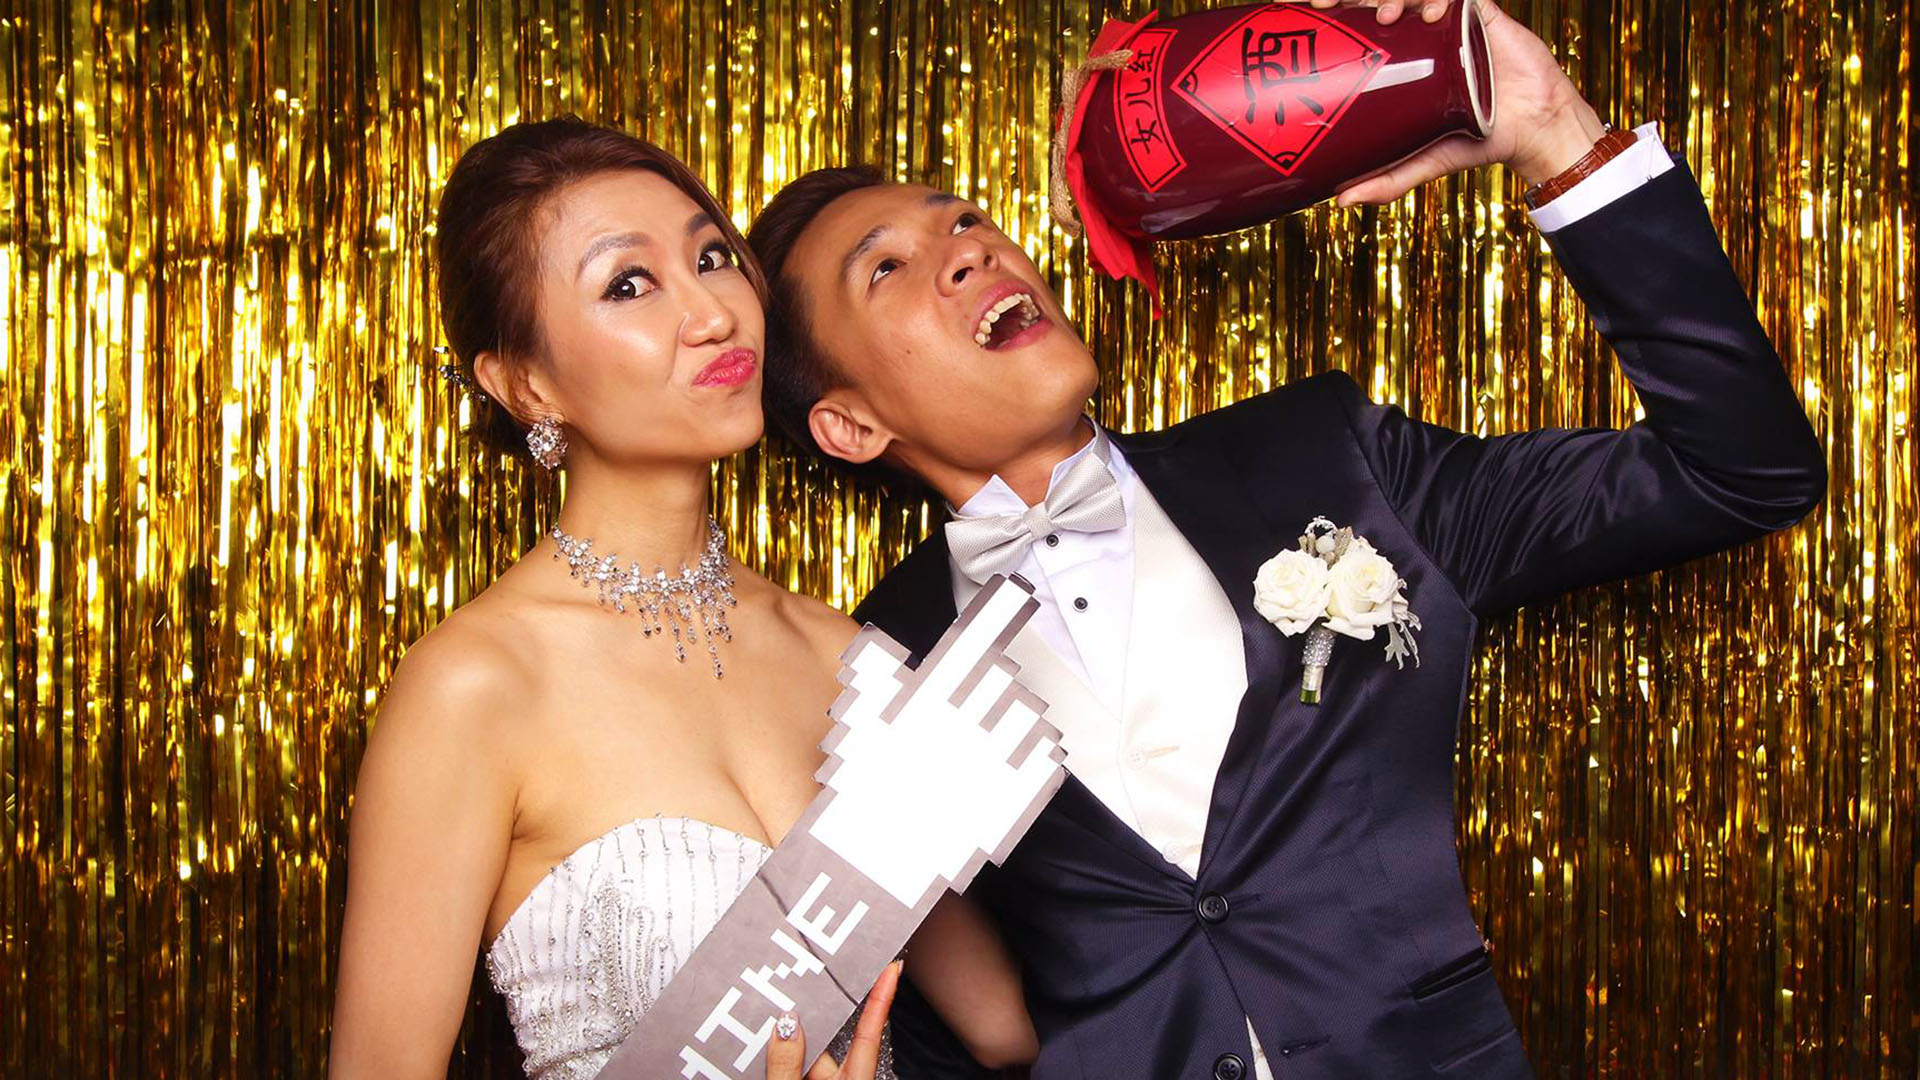 Fourstops Photography • Singapore Photobooth • Jason & Evon Wedding Photobooth Cover